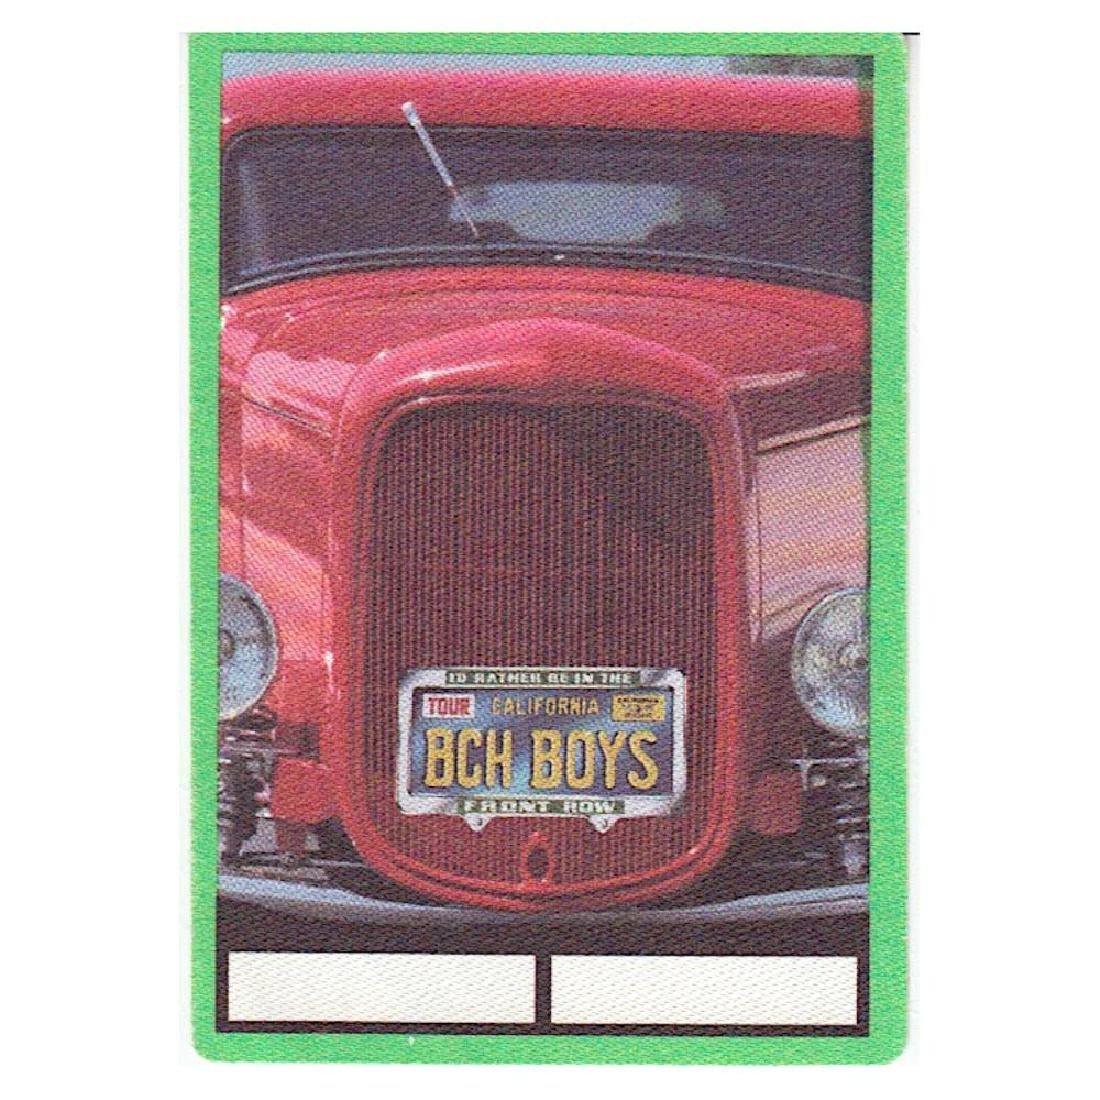 The Beach Boys - 1999 Backstage Pass